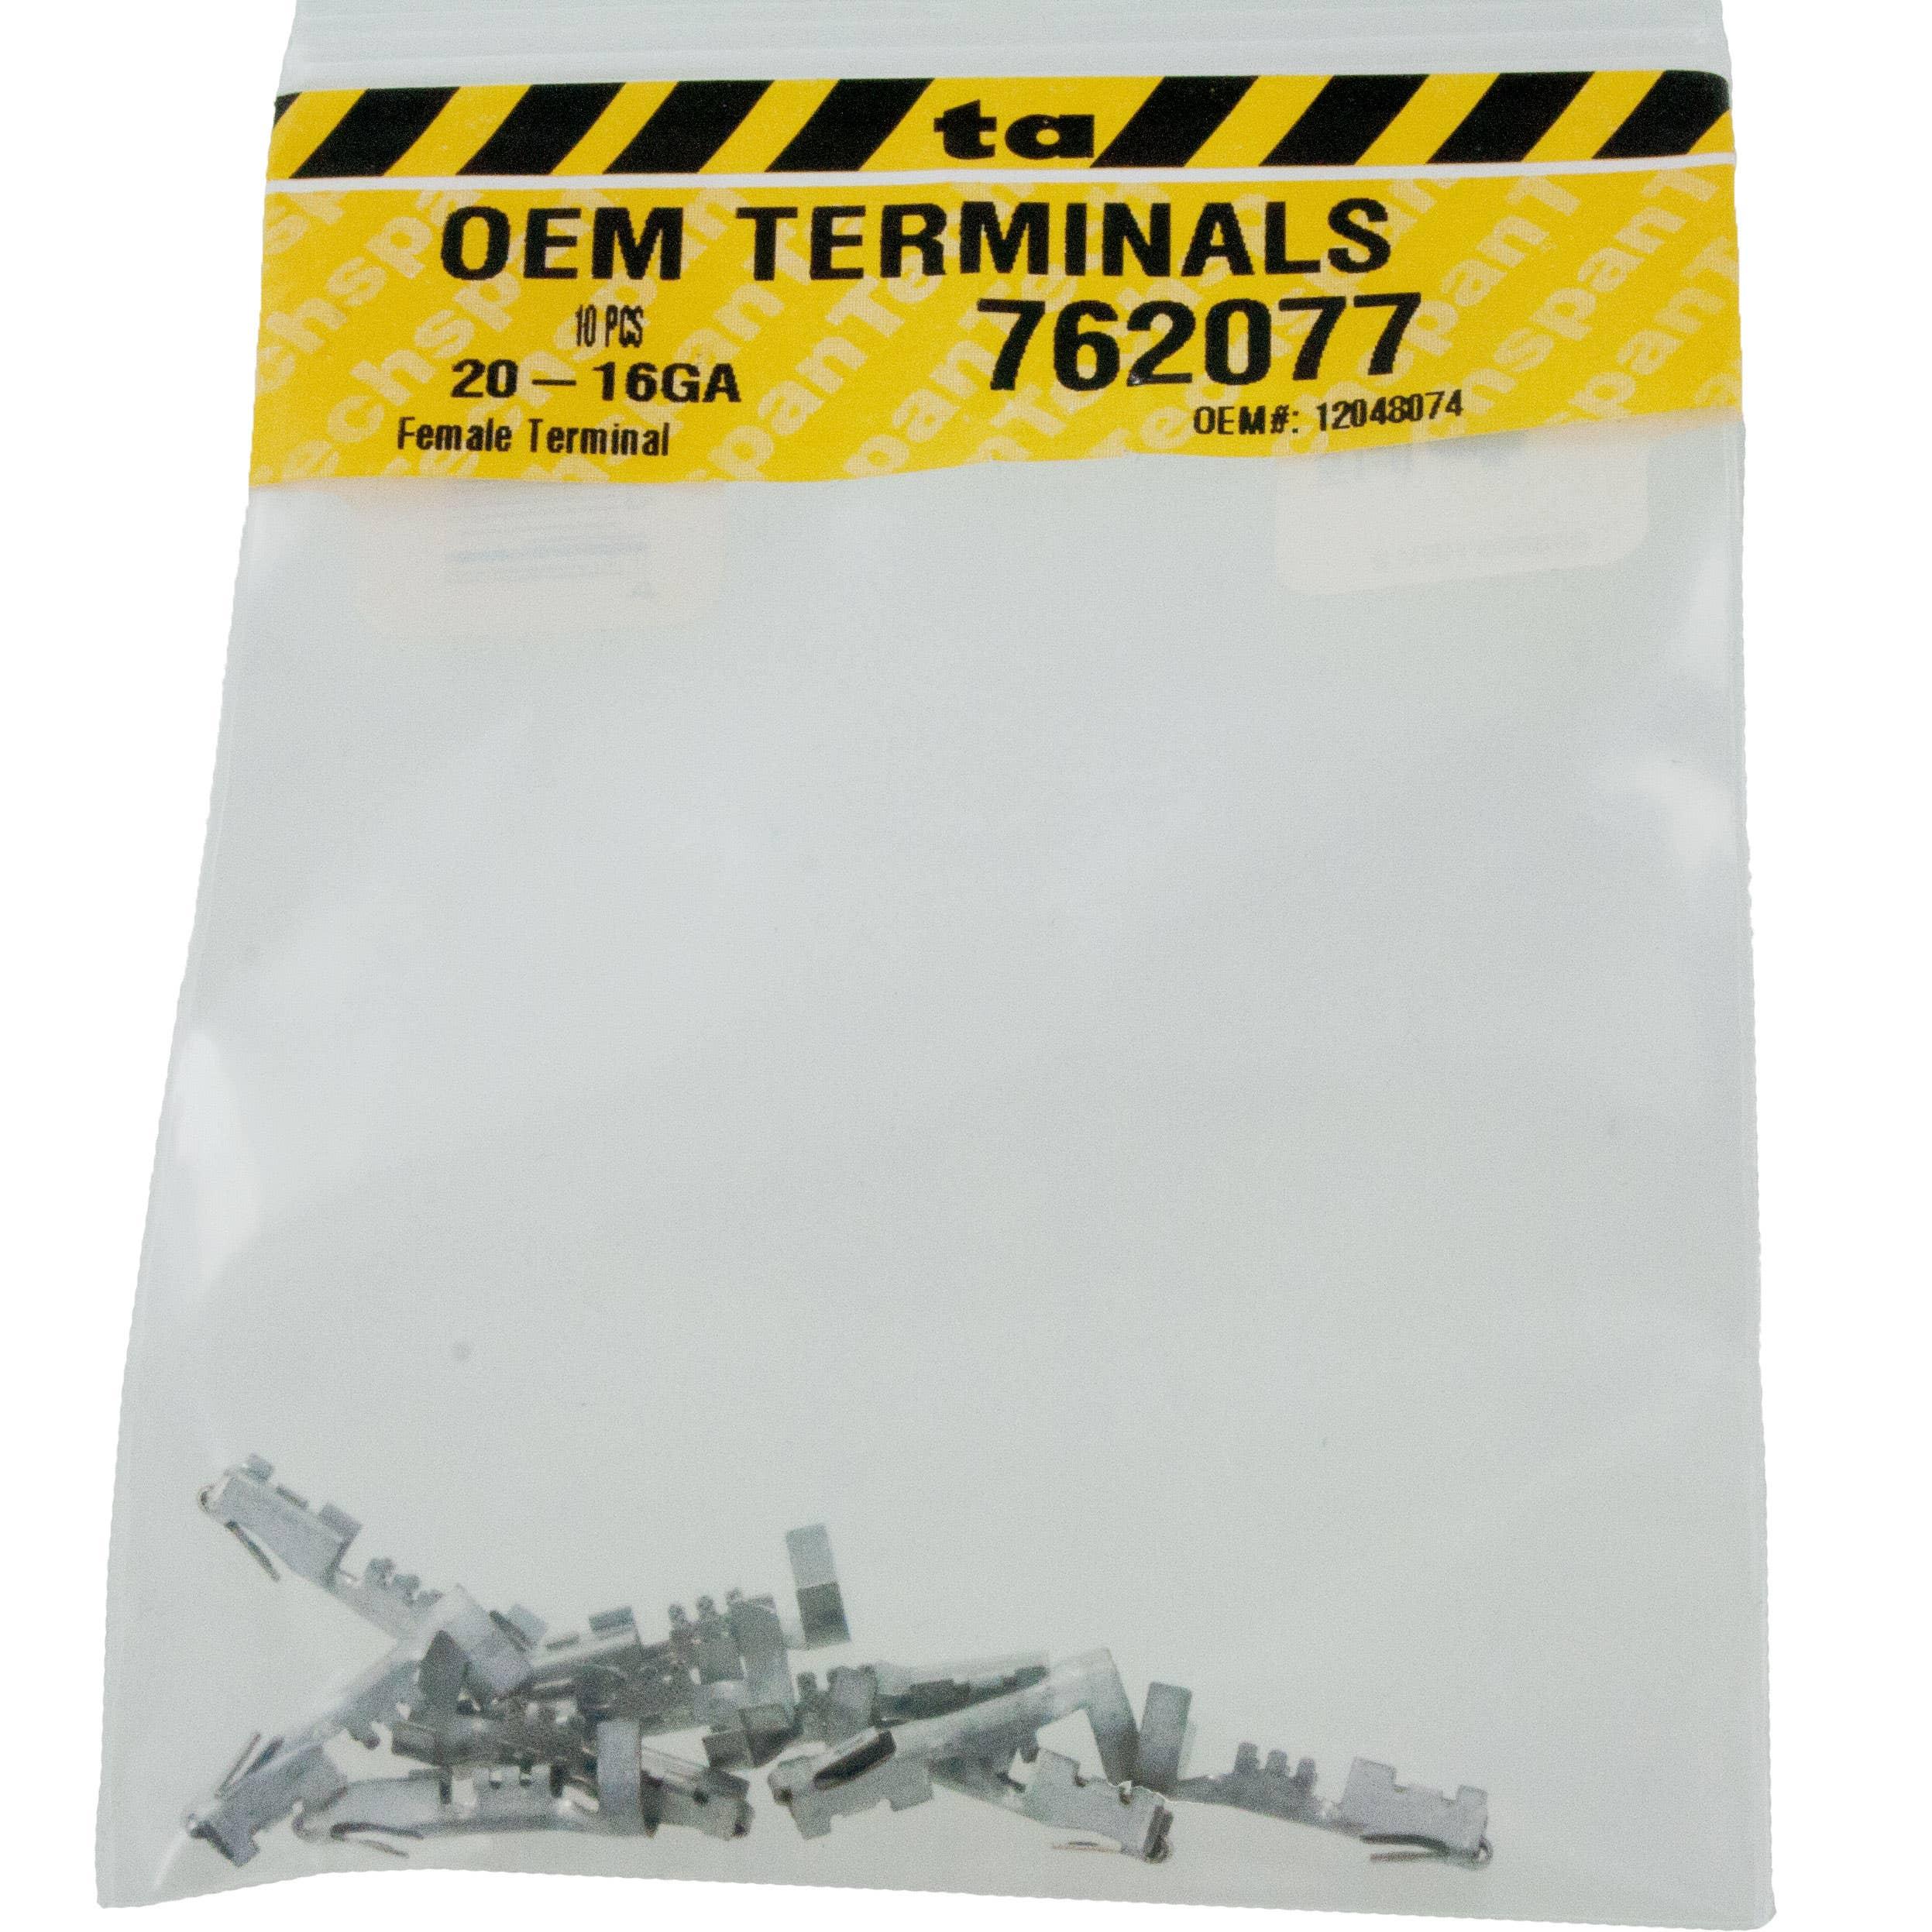 Delphi 12048074 OEM Female Terminal 20-16 Awg | ElecDirect